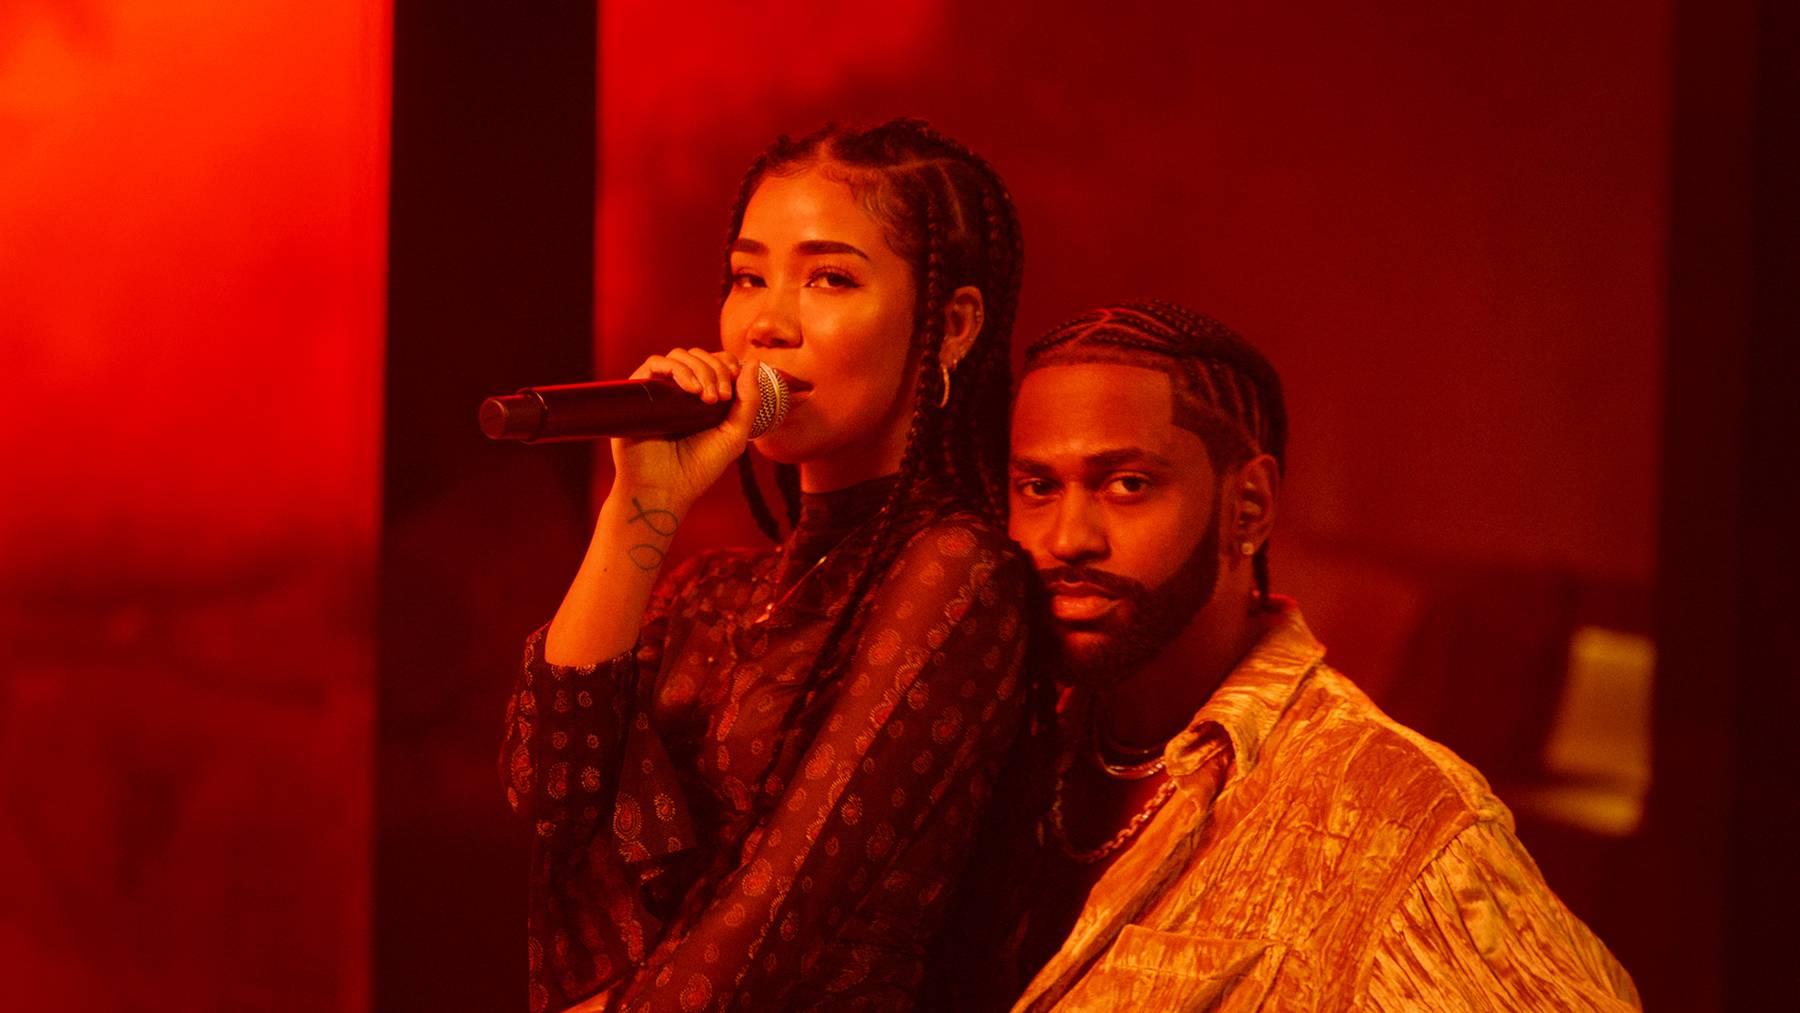 Hip Hop Awards 2020 | Show Highlights Gallery Big Sean/Jhene Aiko | 1920x1080